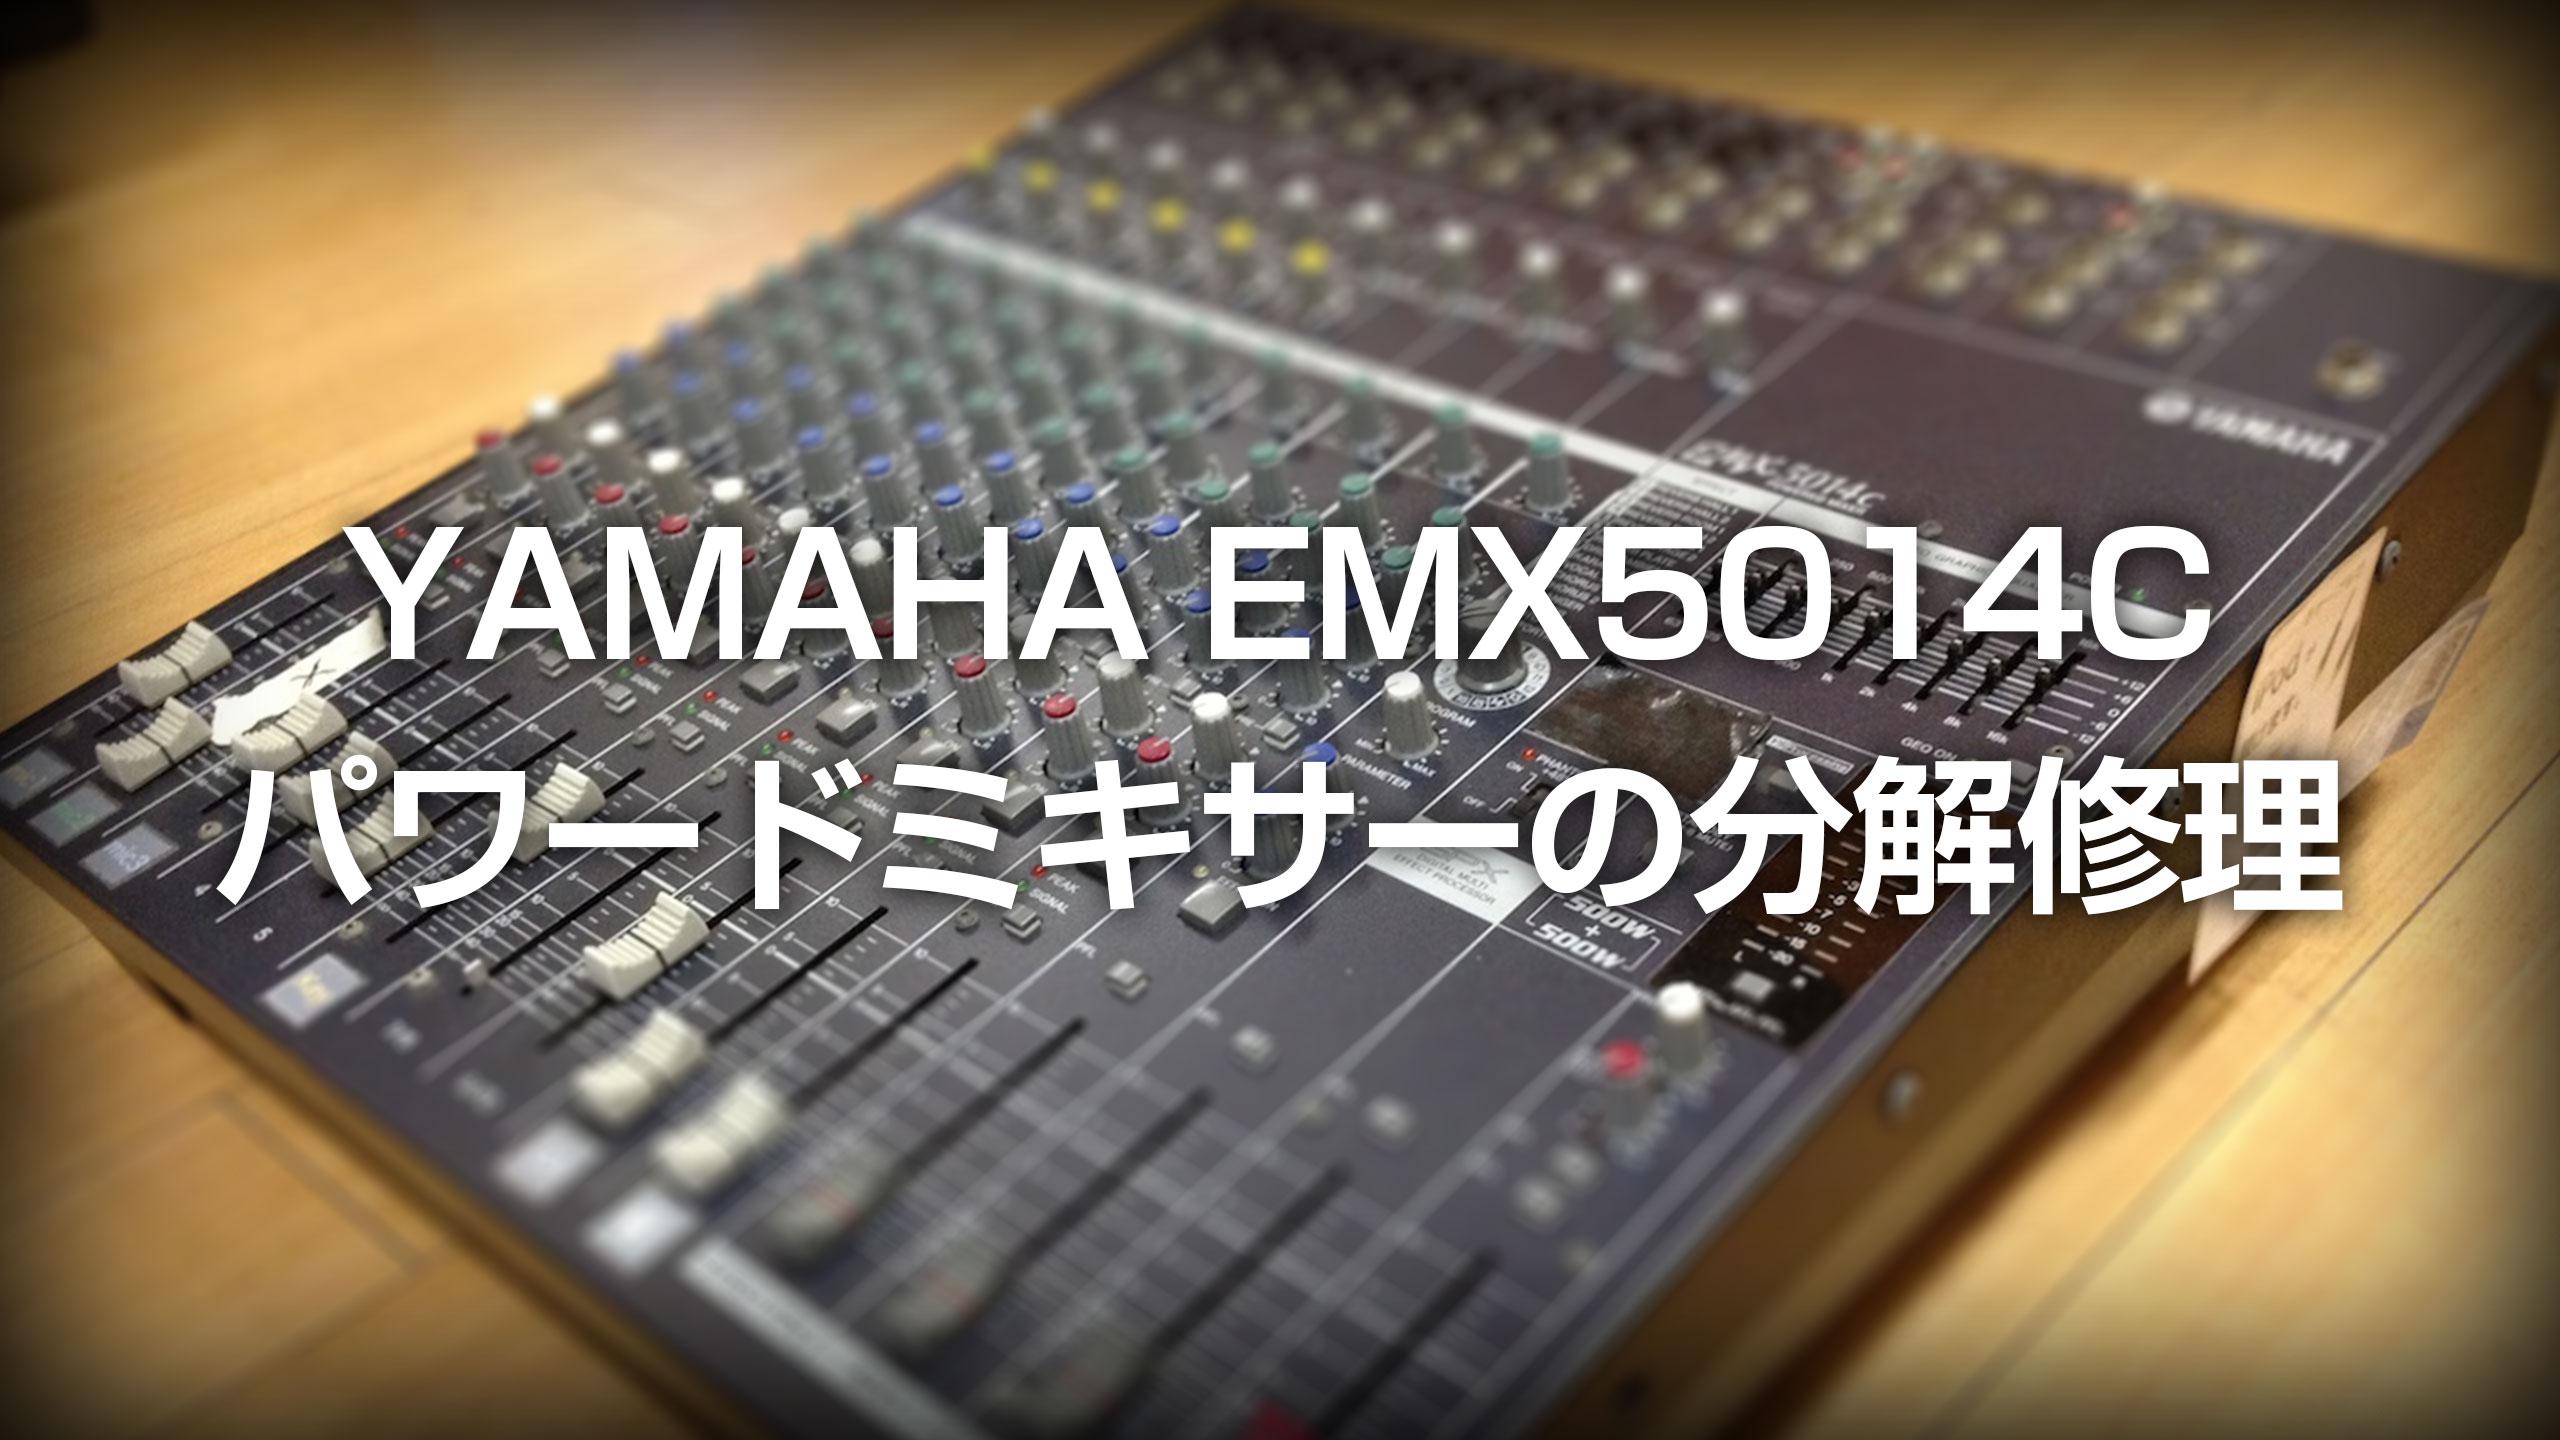 YAMAHA EMX5014C パワードミキサーの分解修理